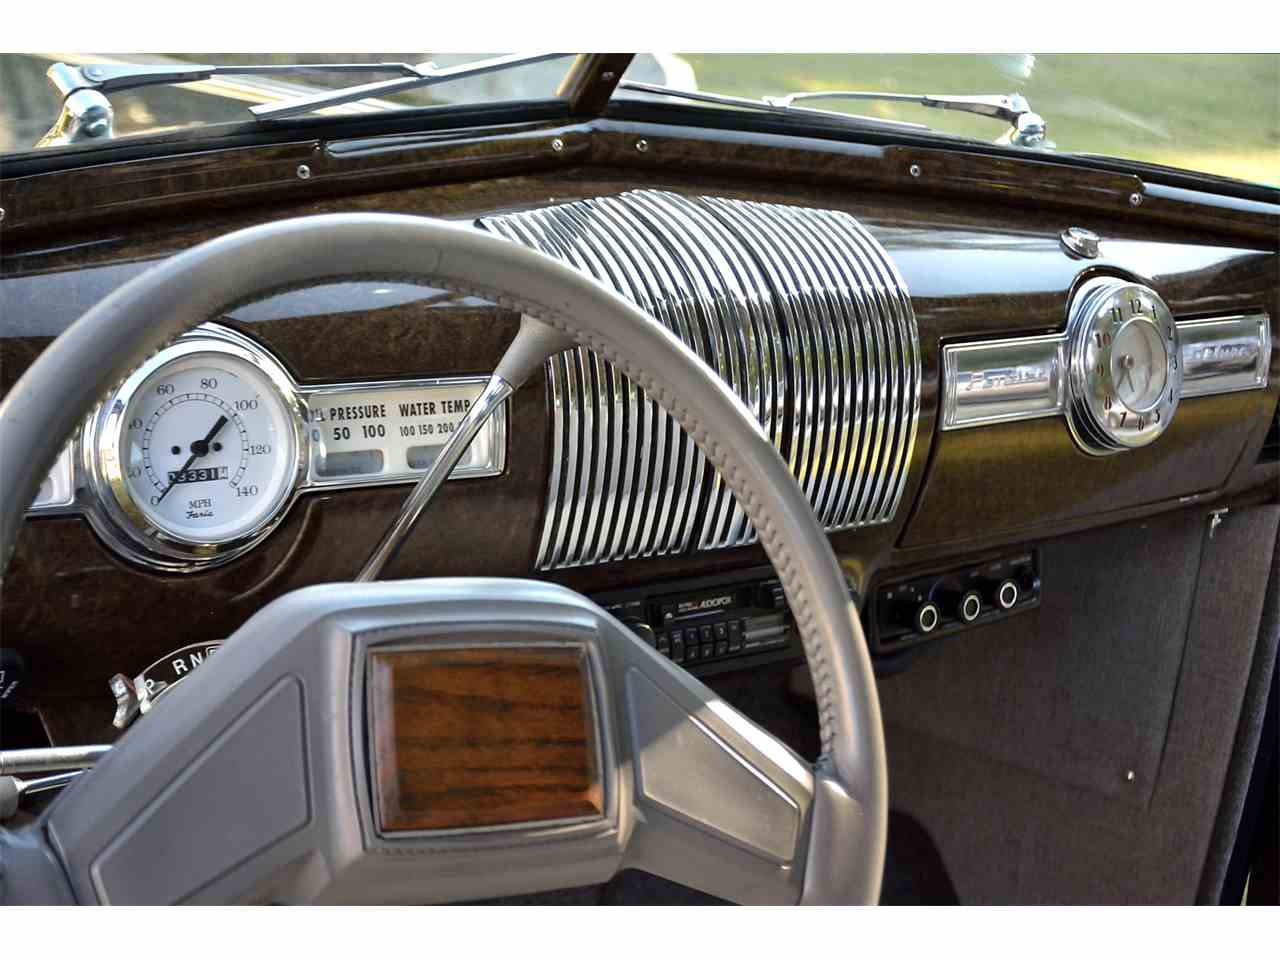 1940 pontiac 2 dr sedan for sale cc 910462 for 1940 pontiac 2 door sedan